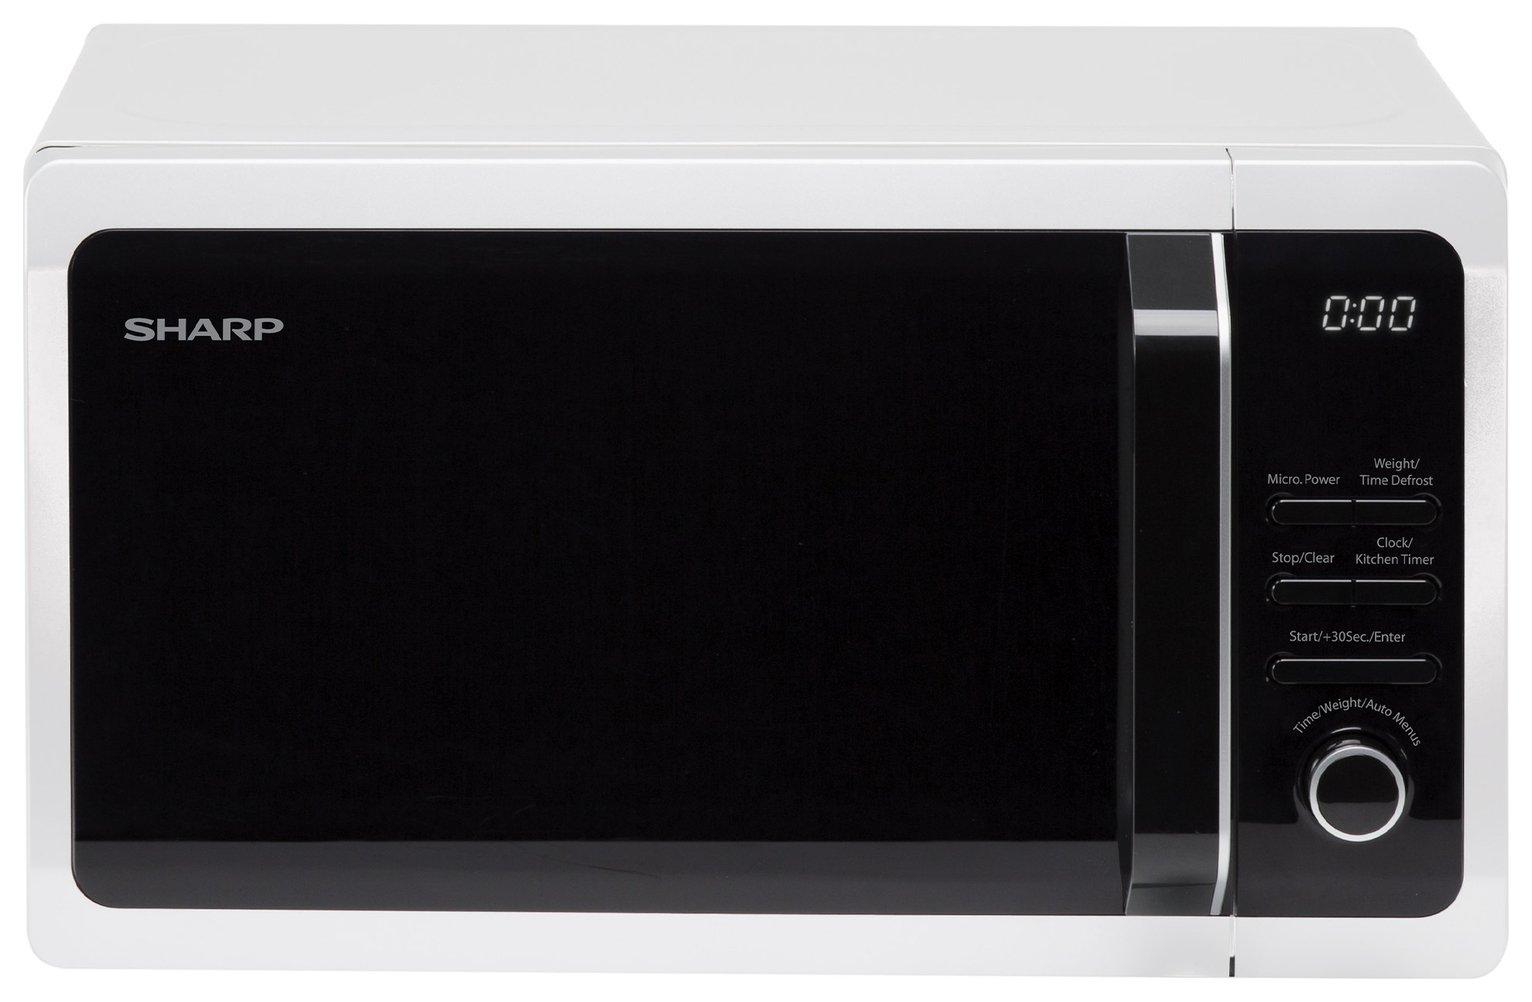 Sharp - R274WM 800W Microwave - White